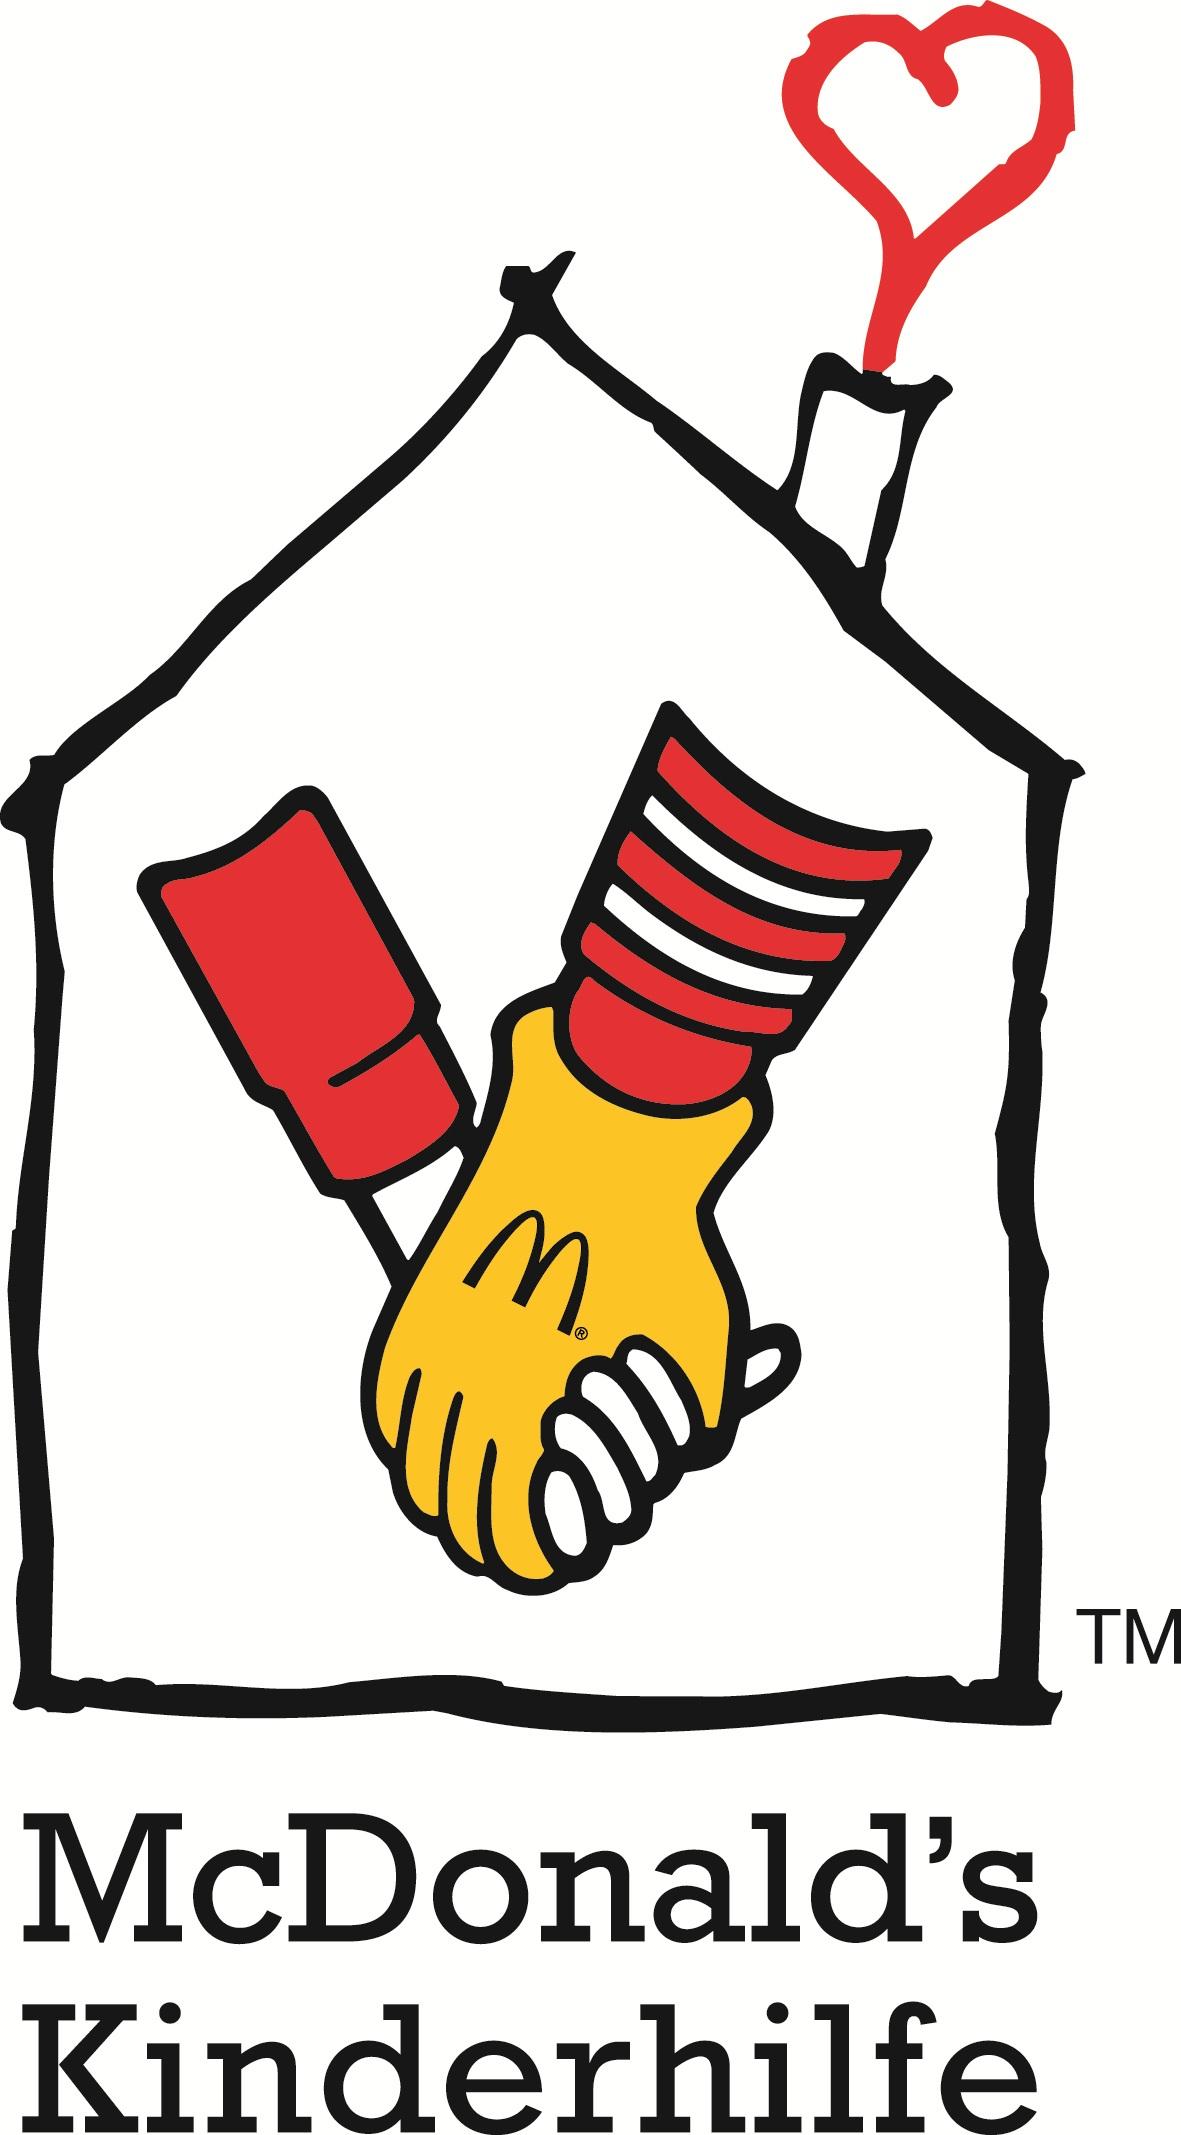 McDonaldsKinderhilfe_Logo